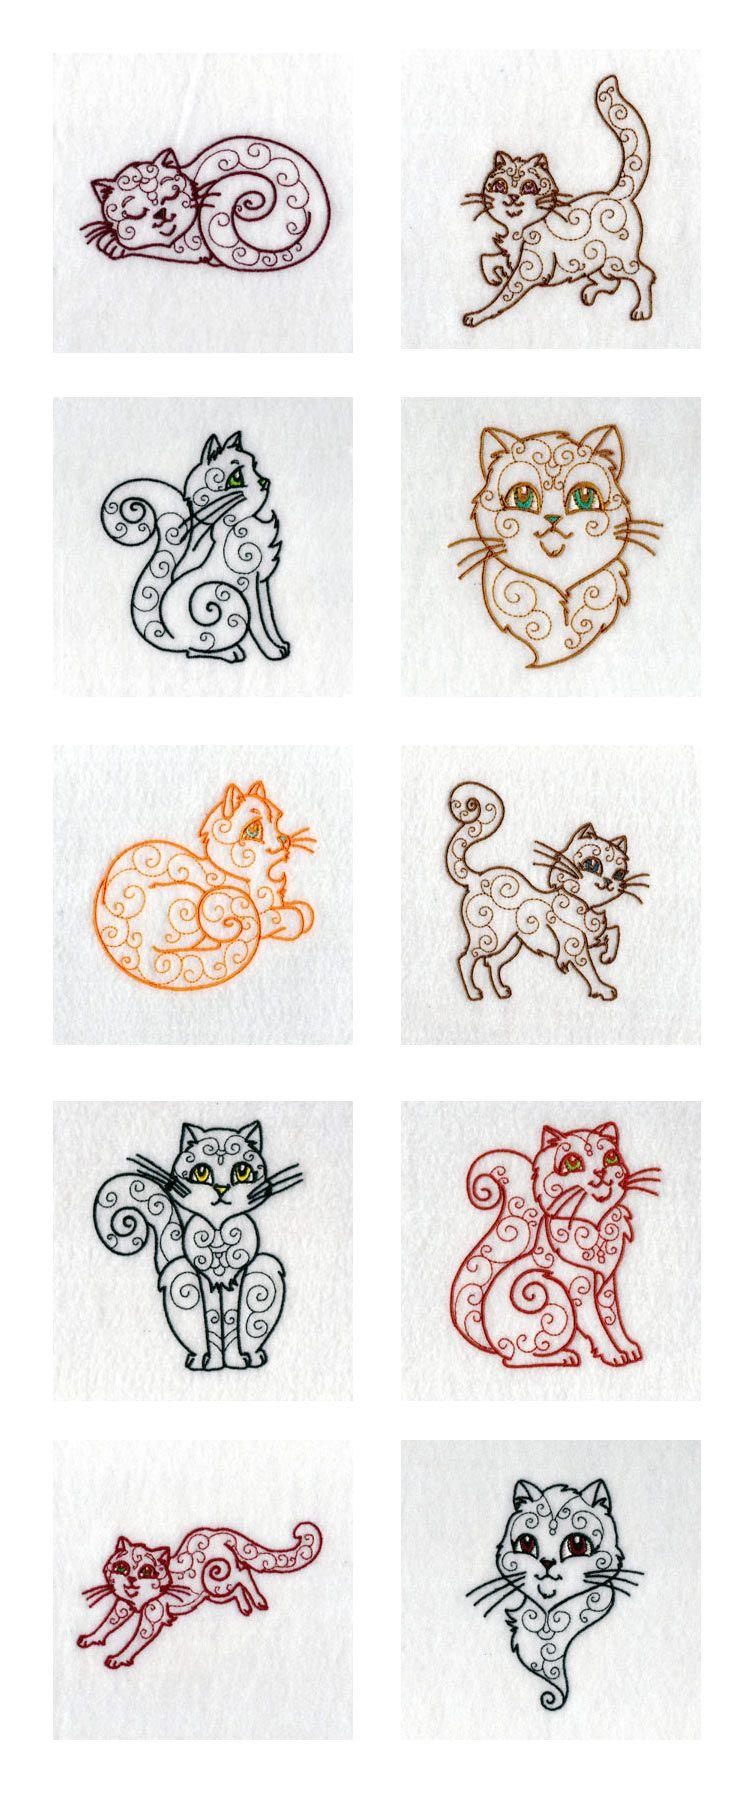 Swirly Cats Embroidery Machine Design Details | tattoo | Bordado ...